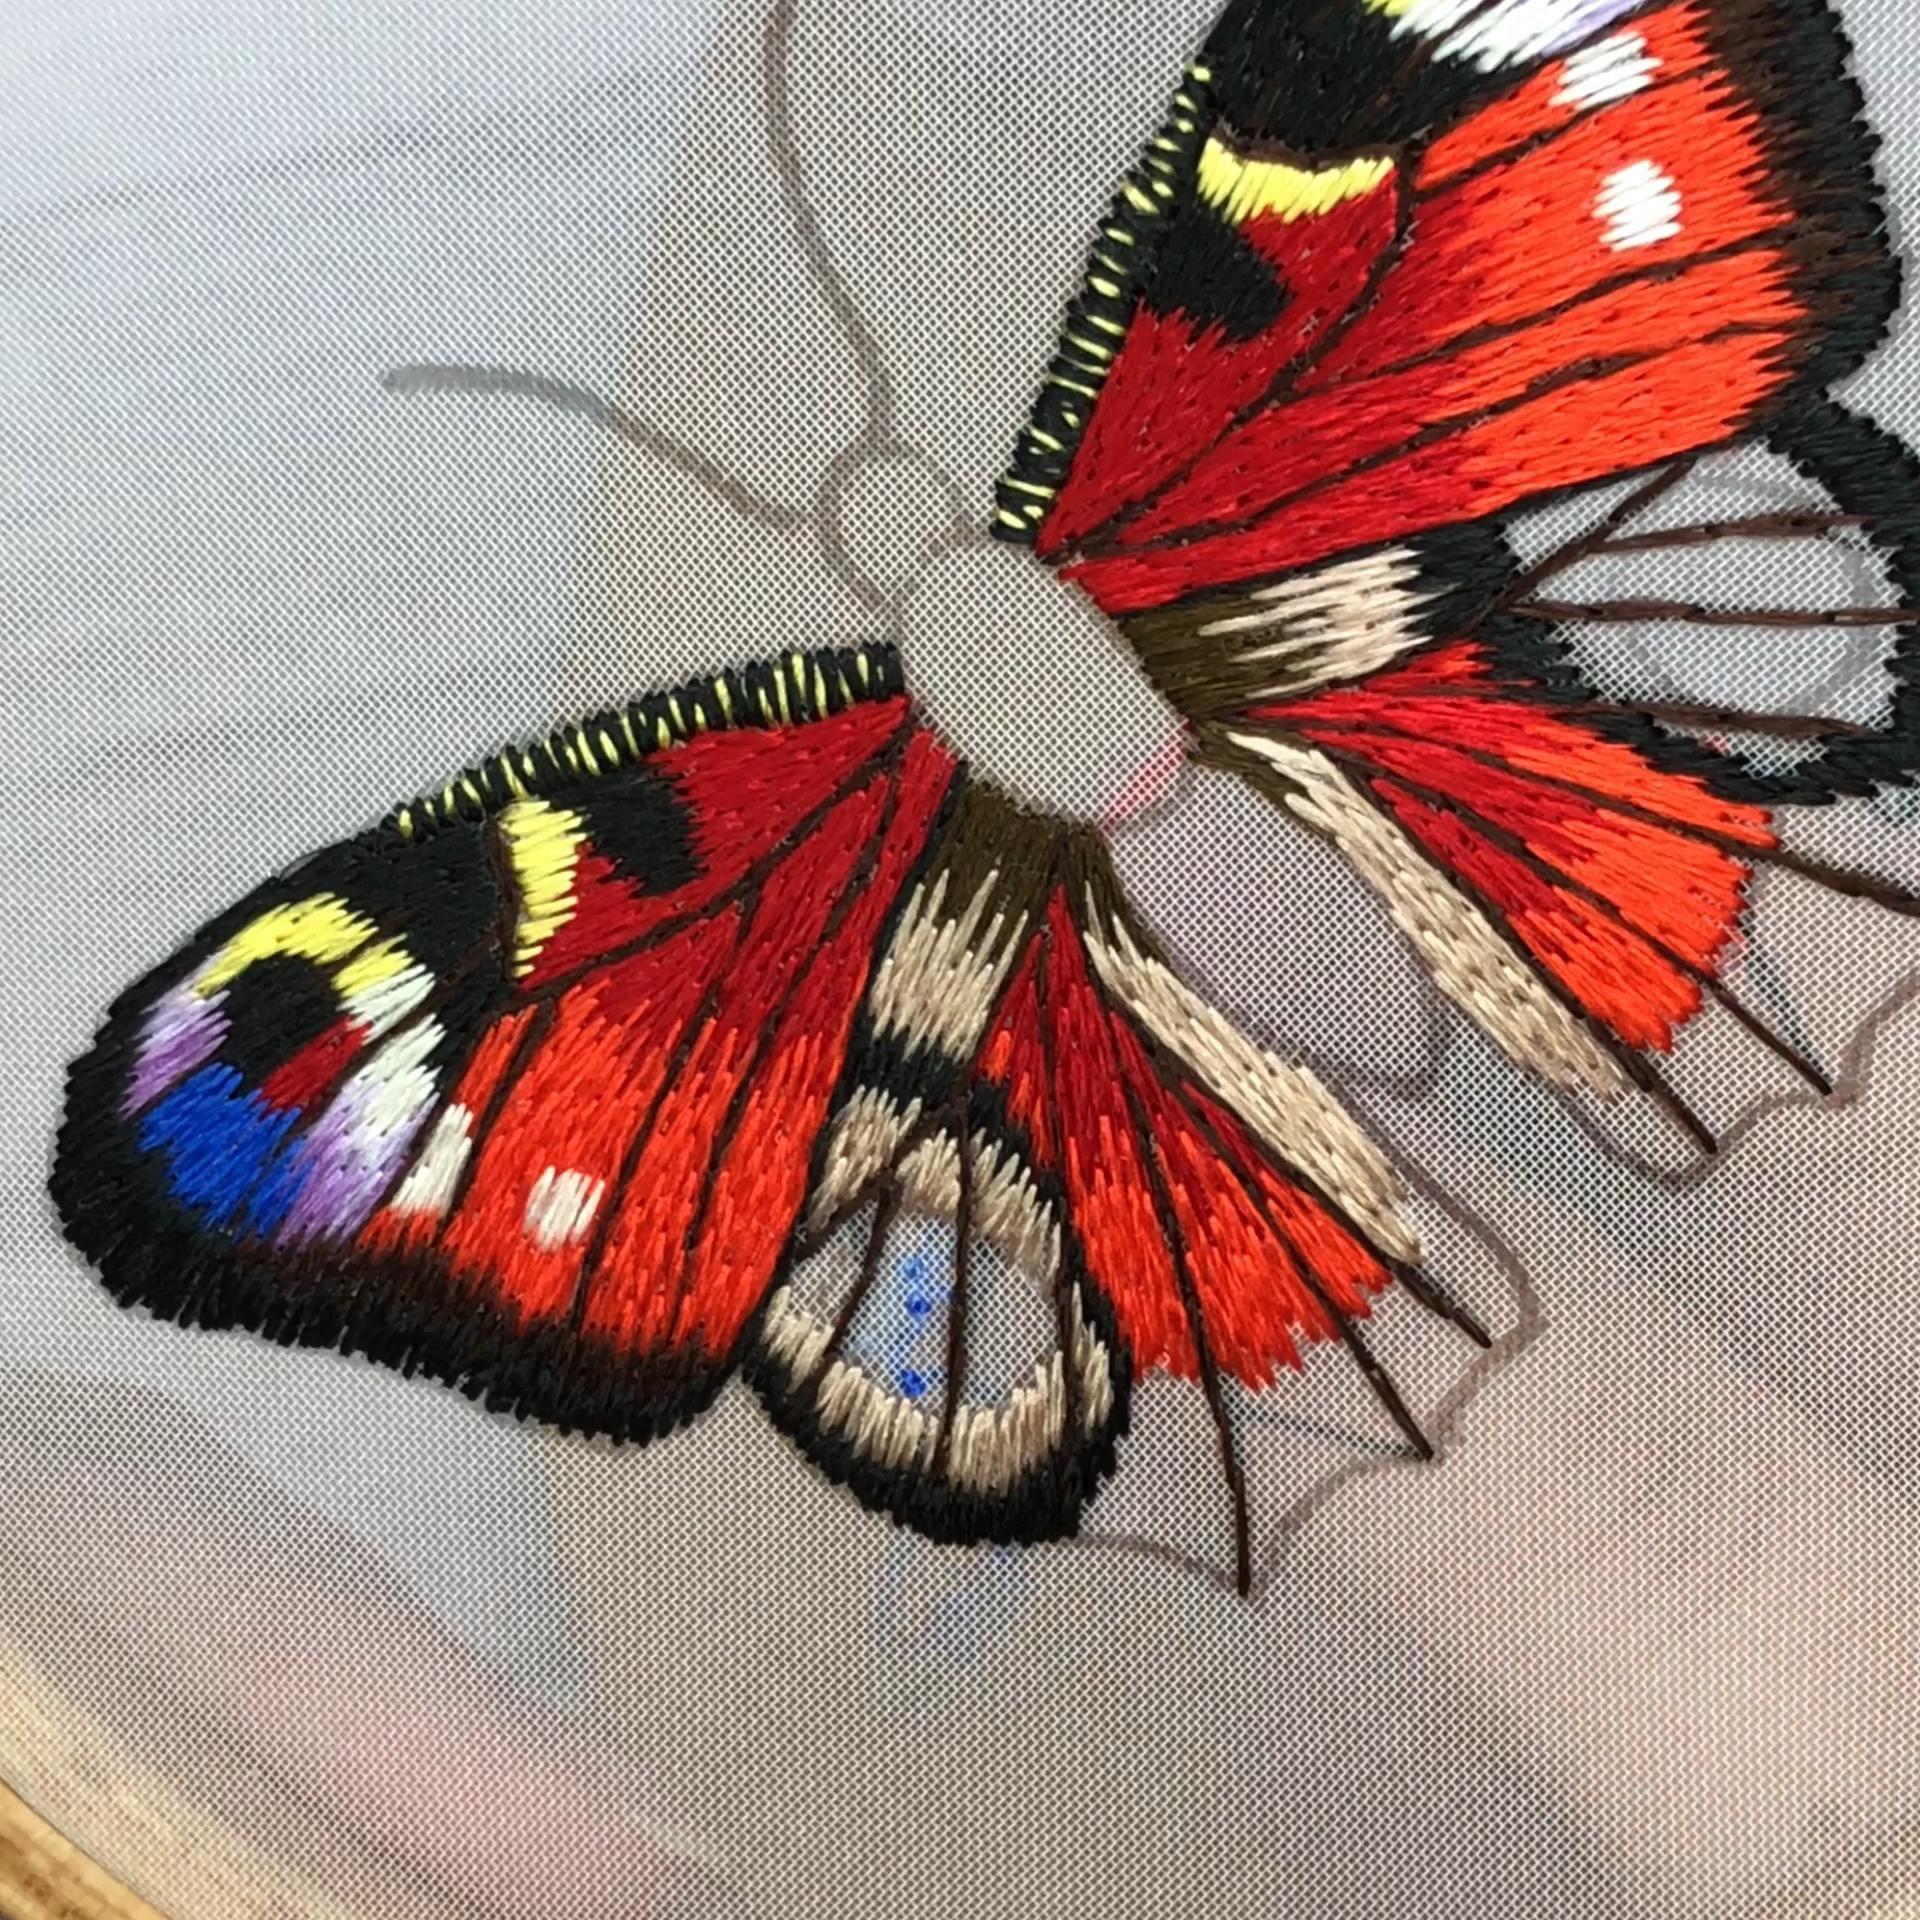 Digital hand embroidery Peacock butterfly PDF patt